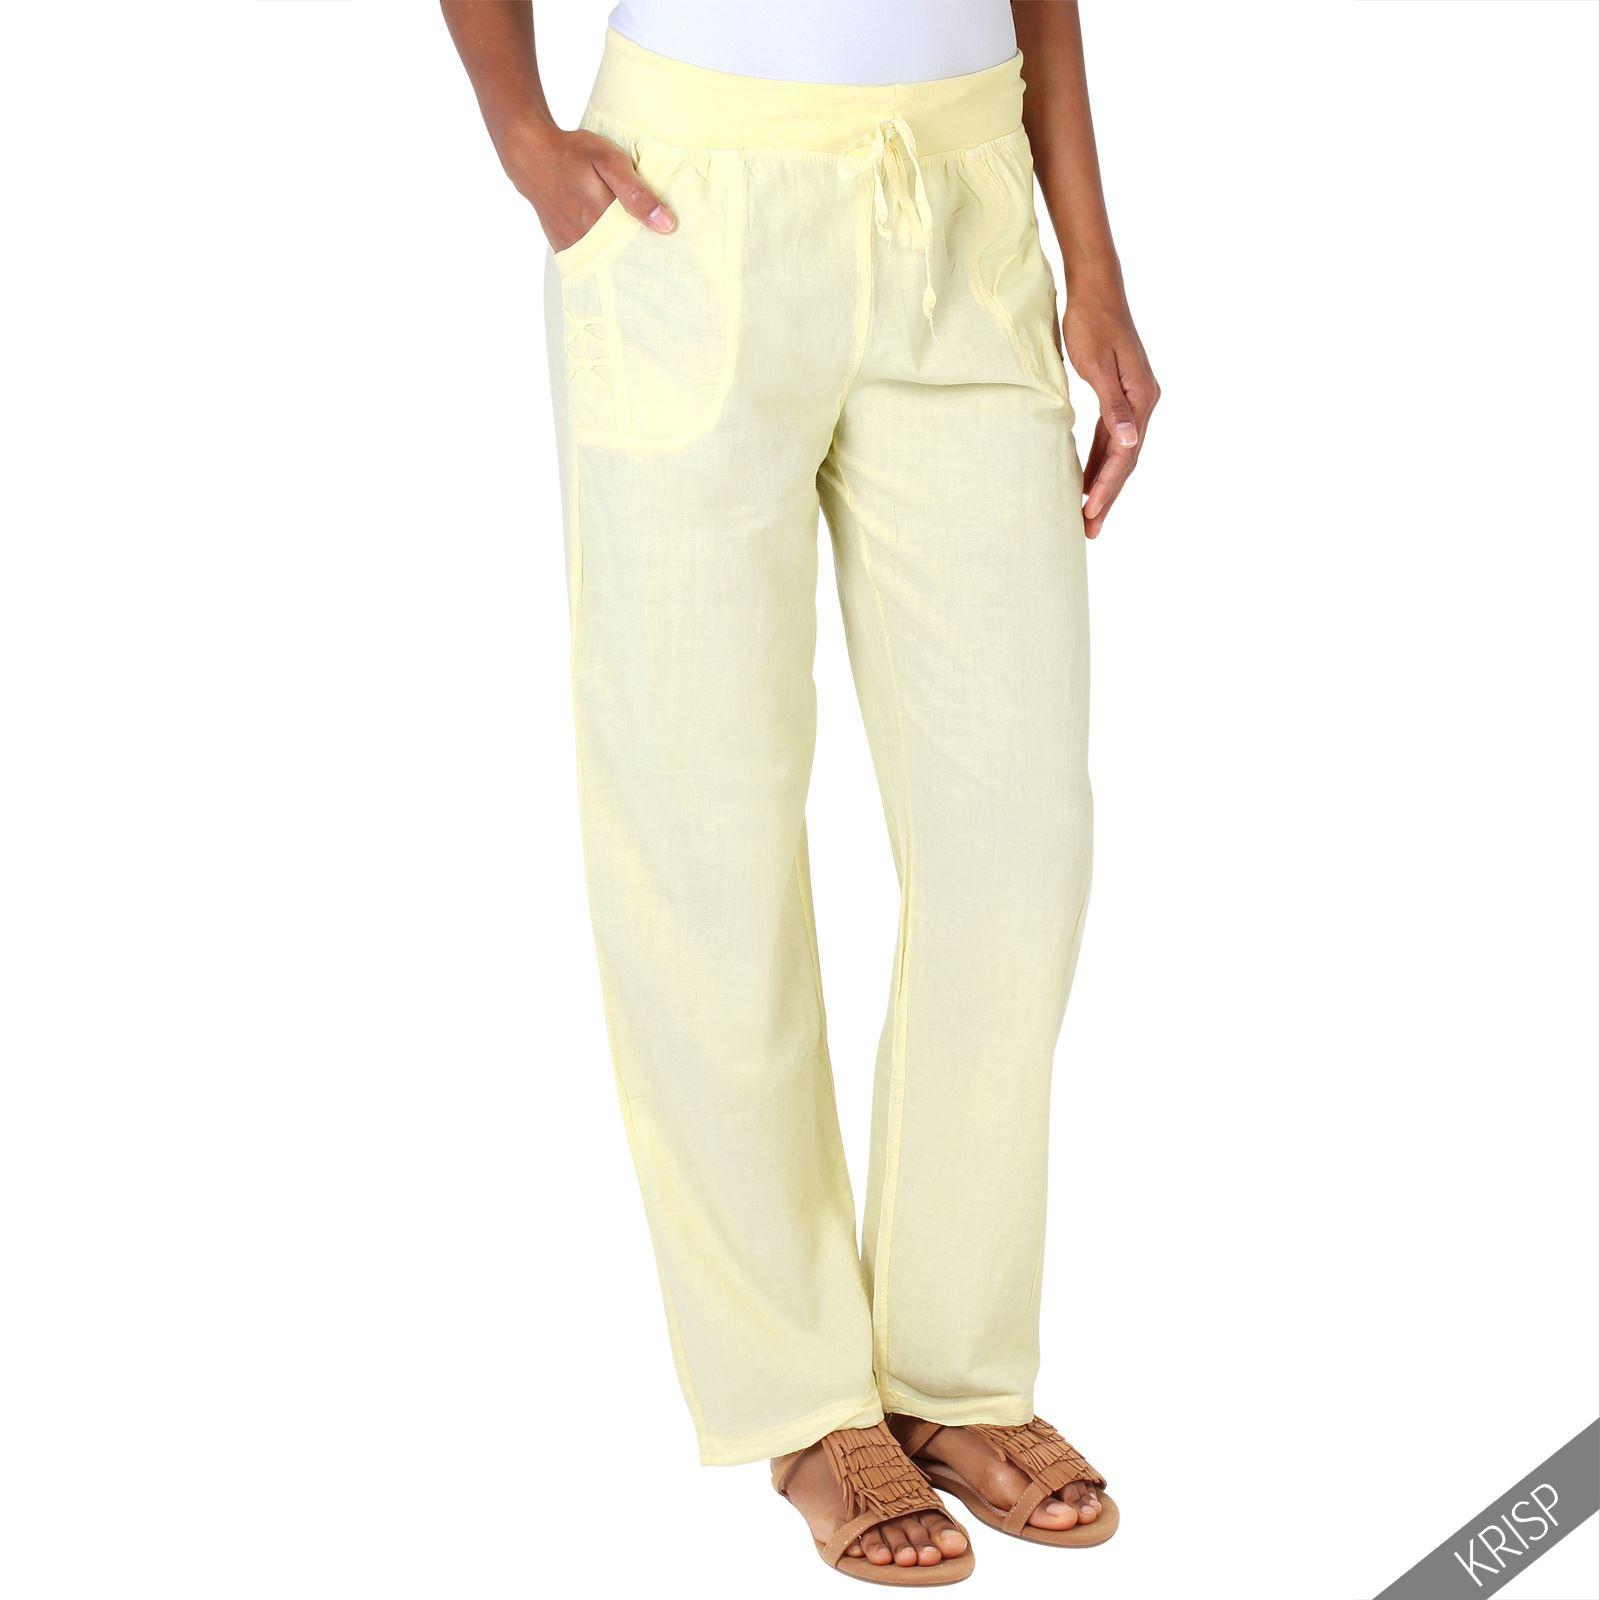 Model Womens Linen Trousers Cropped Capri Or Full Length Pants Casual Fit Size UK 8-18 | EBay